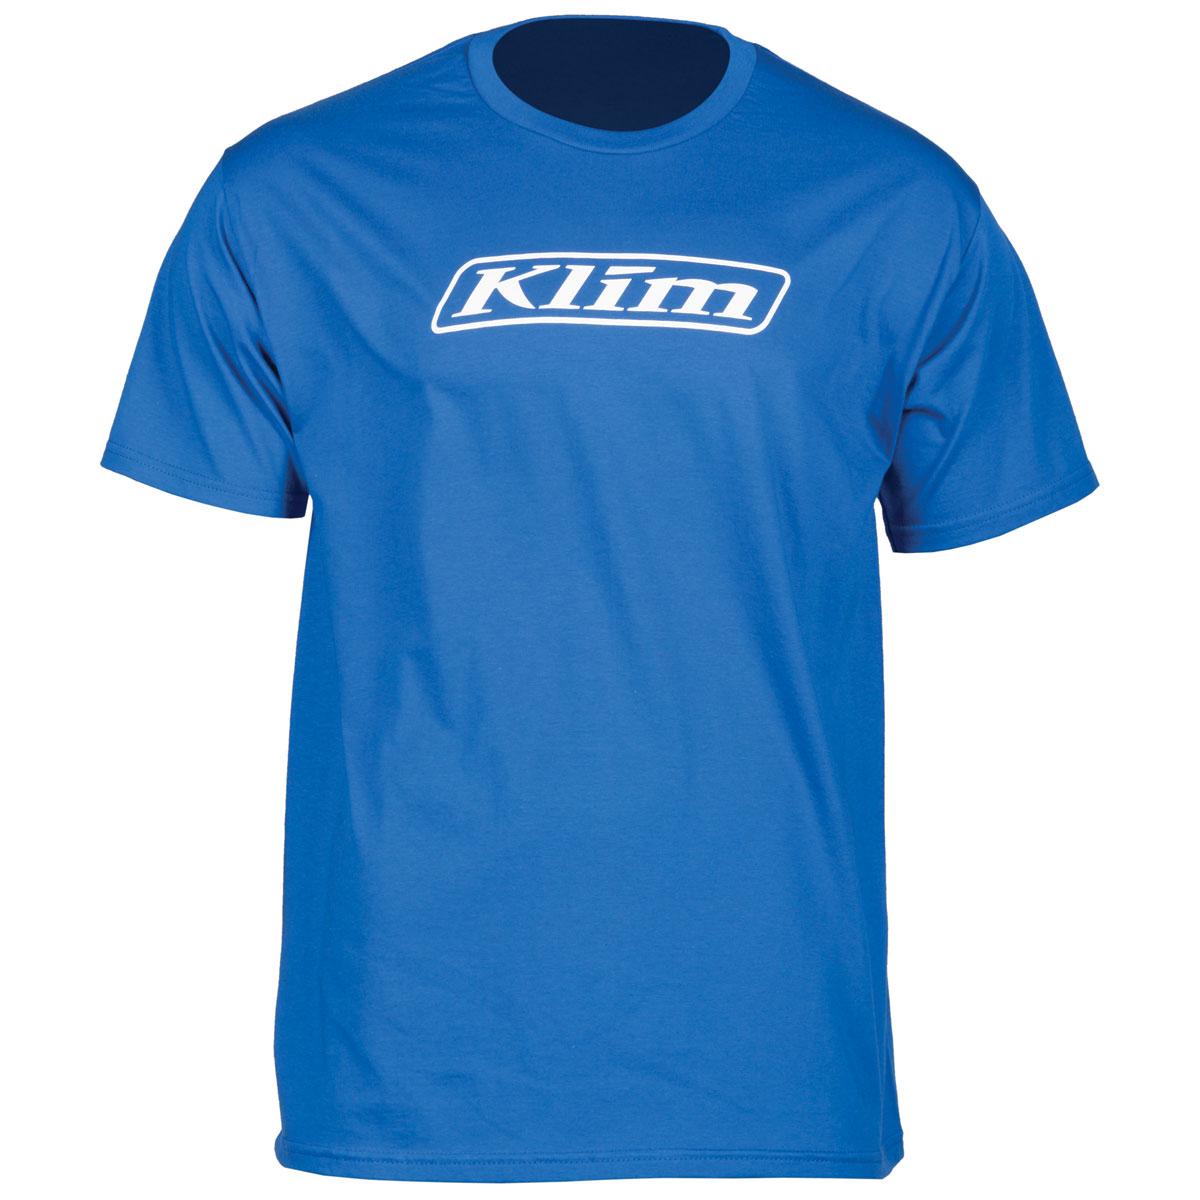 Klim Men's Word Royal Blue T-Shirt